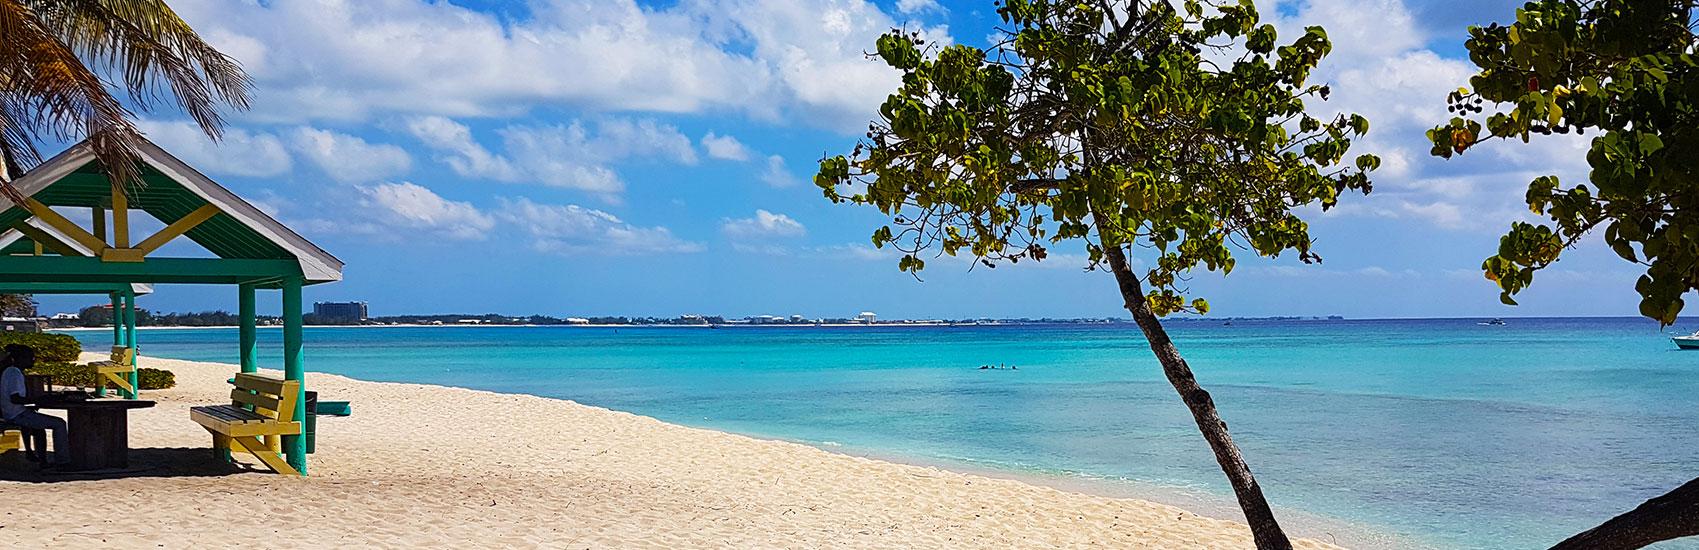 Western  Caribbean March Break 2023 Cruise 2